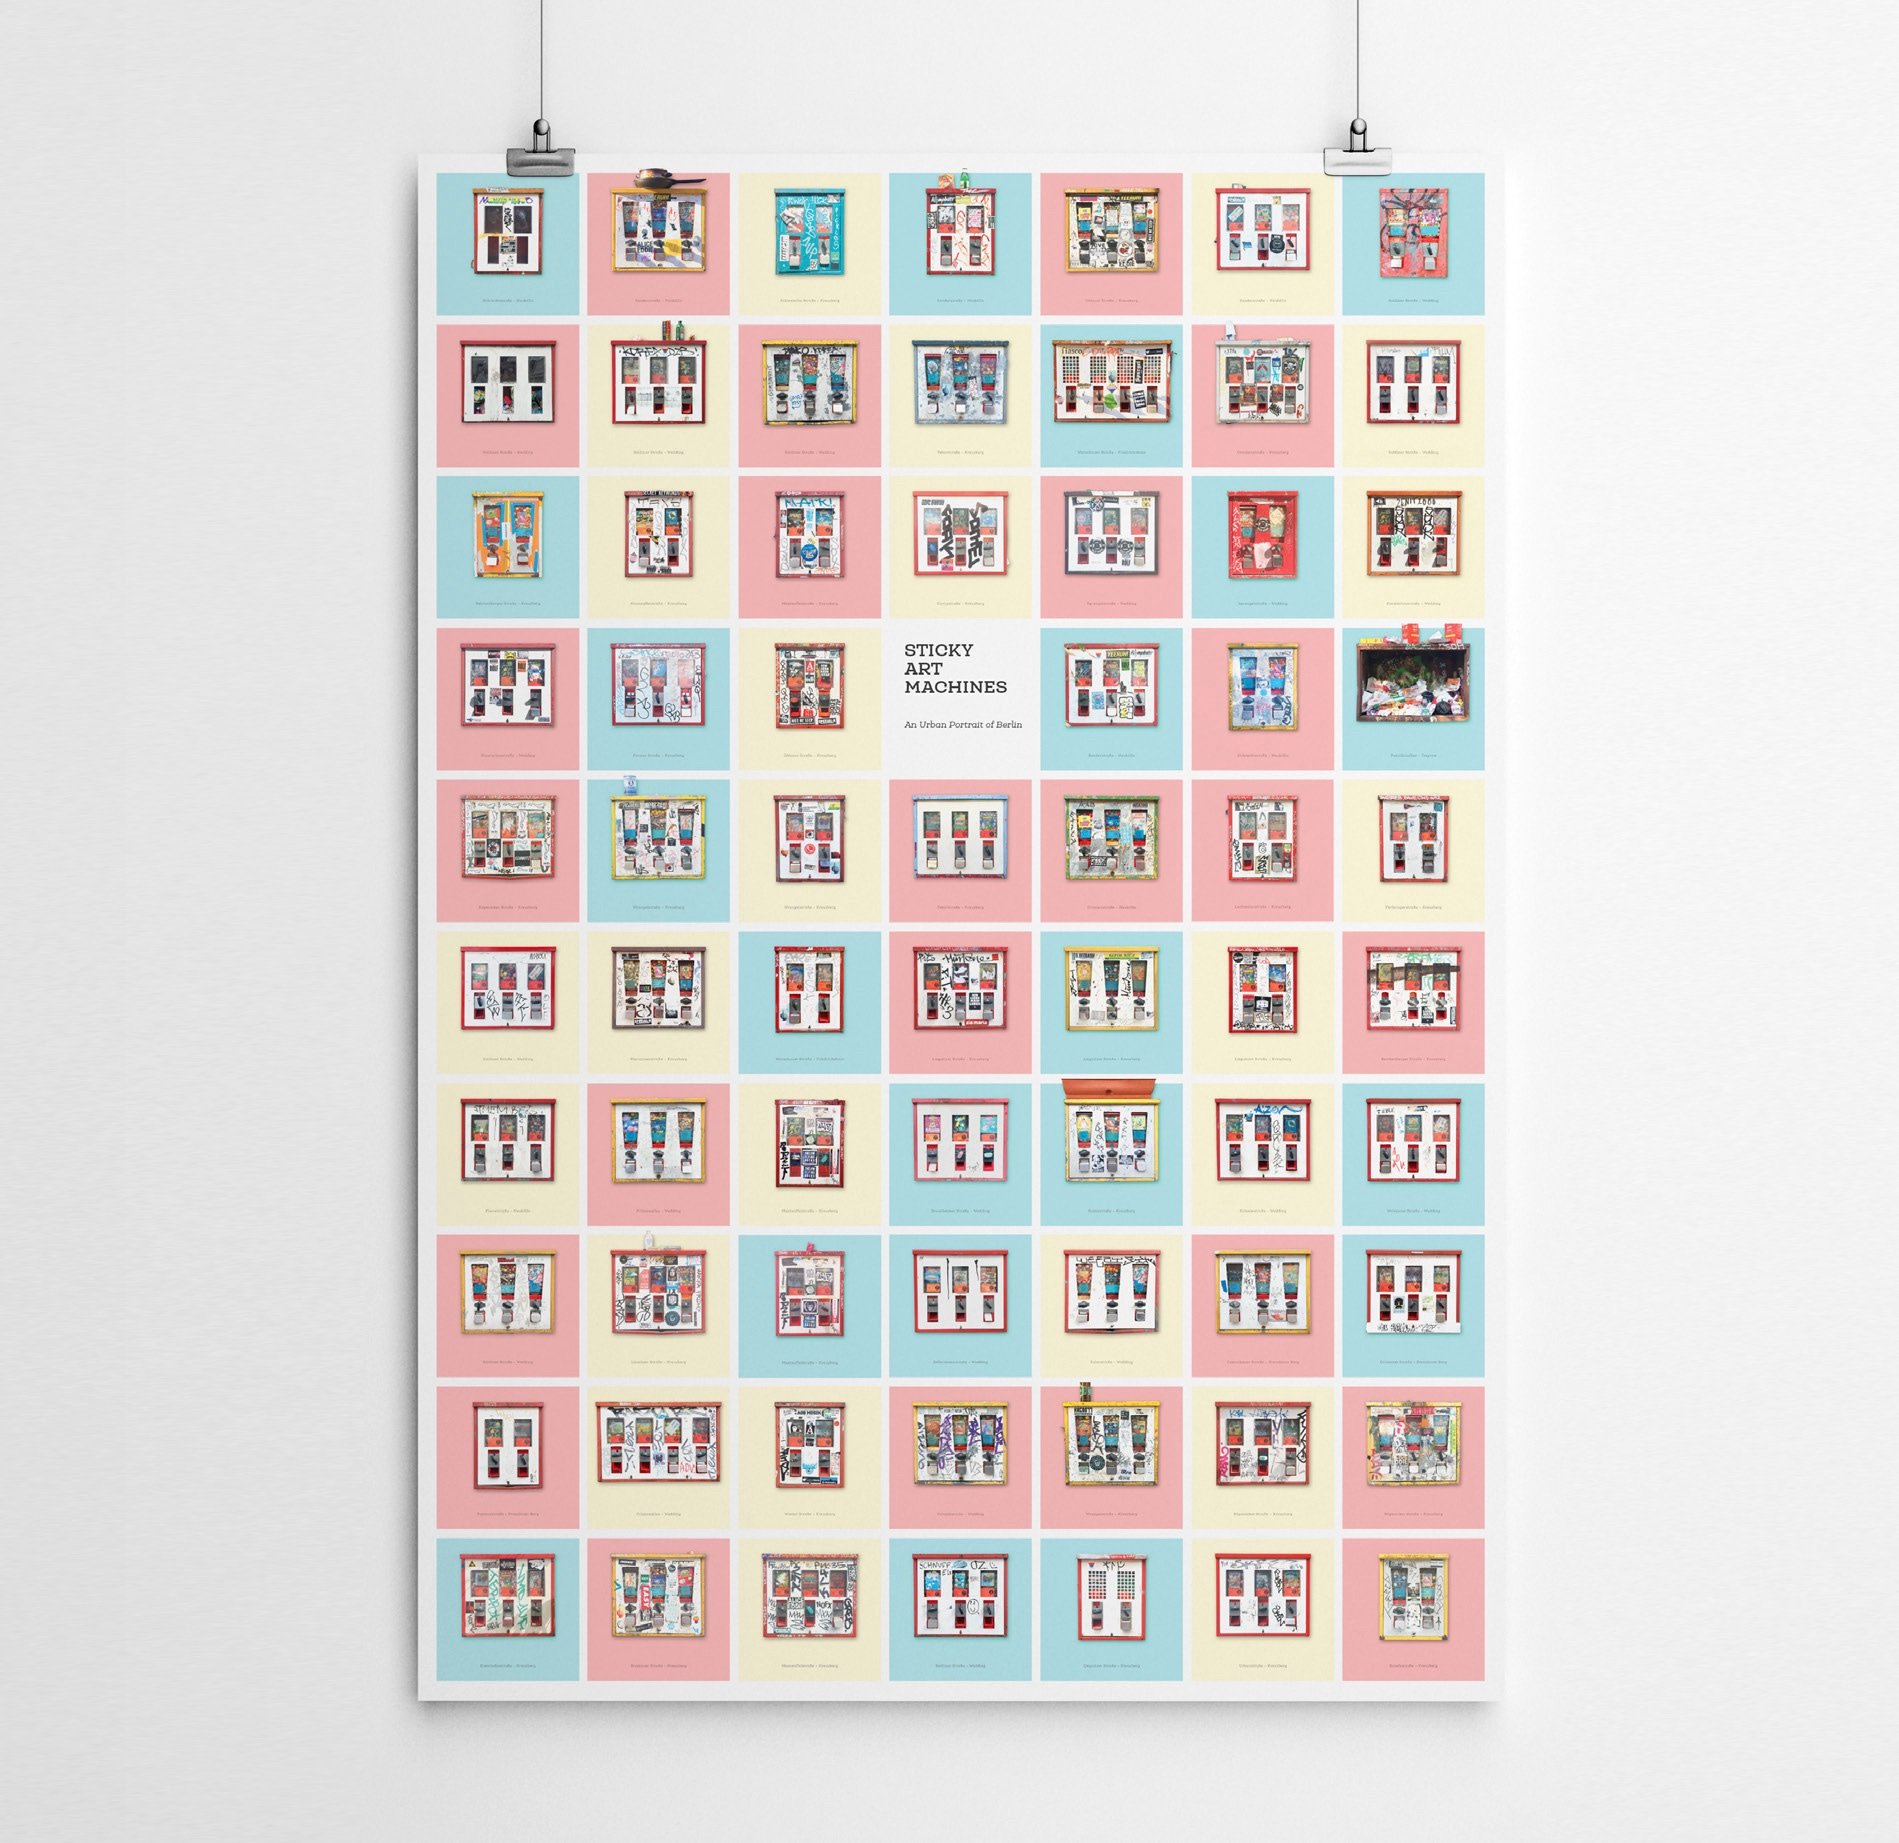 BI_161122_fotoprojekt_kaugummiautomaten_plakat